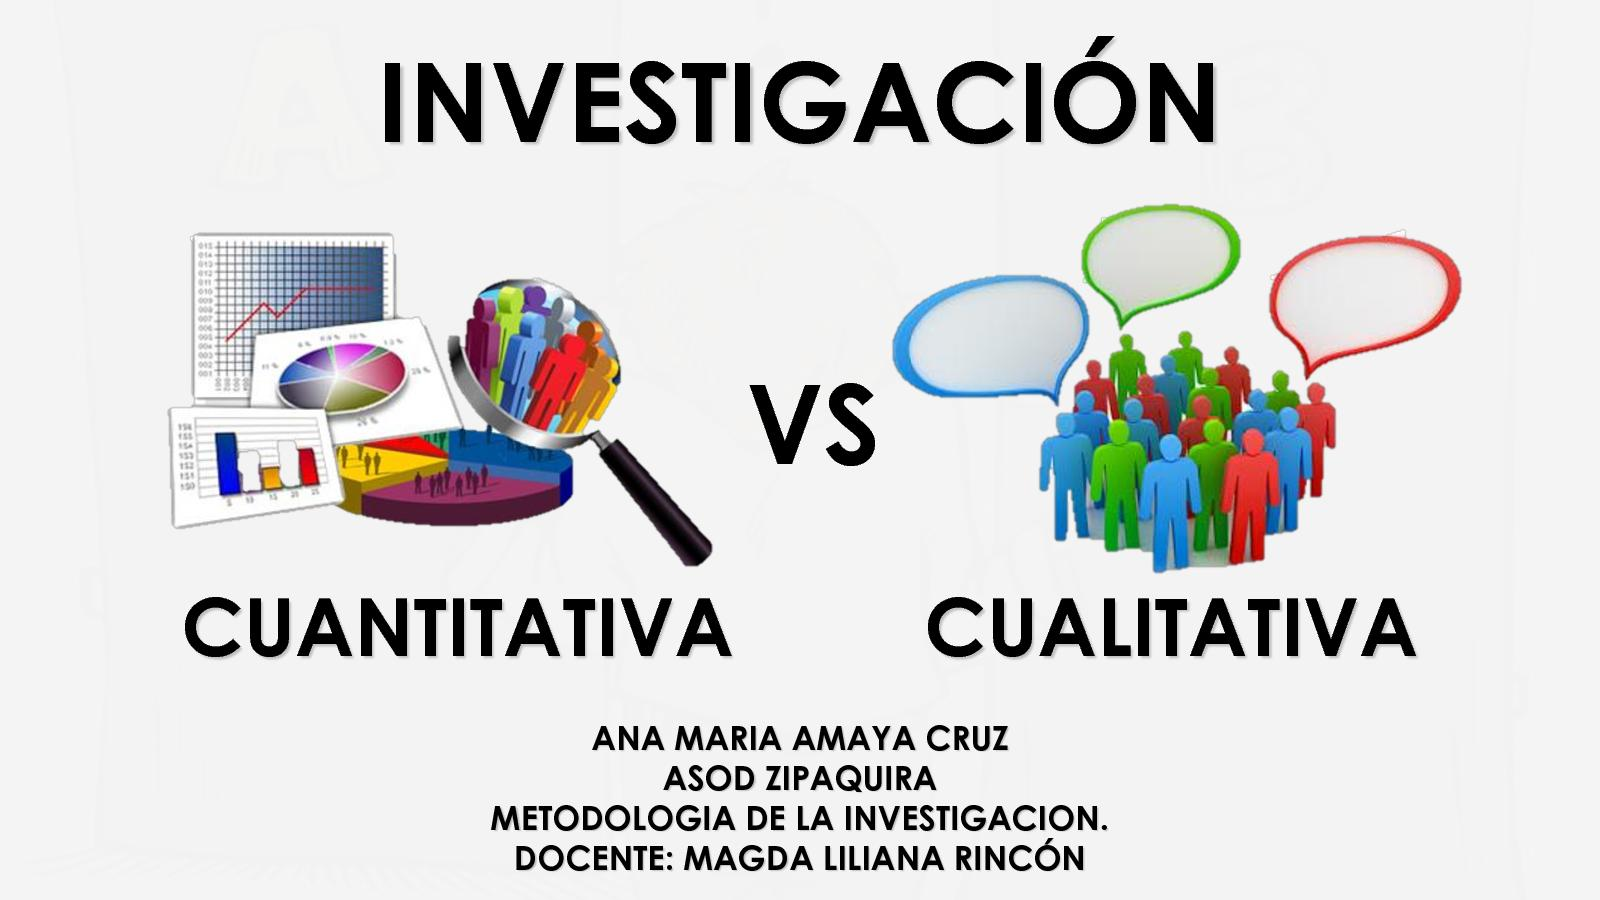 DIFERENCIAS INVESTIGACION CUALITATIVA VS CUANTITATIVA.